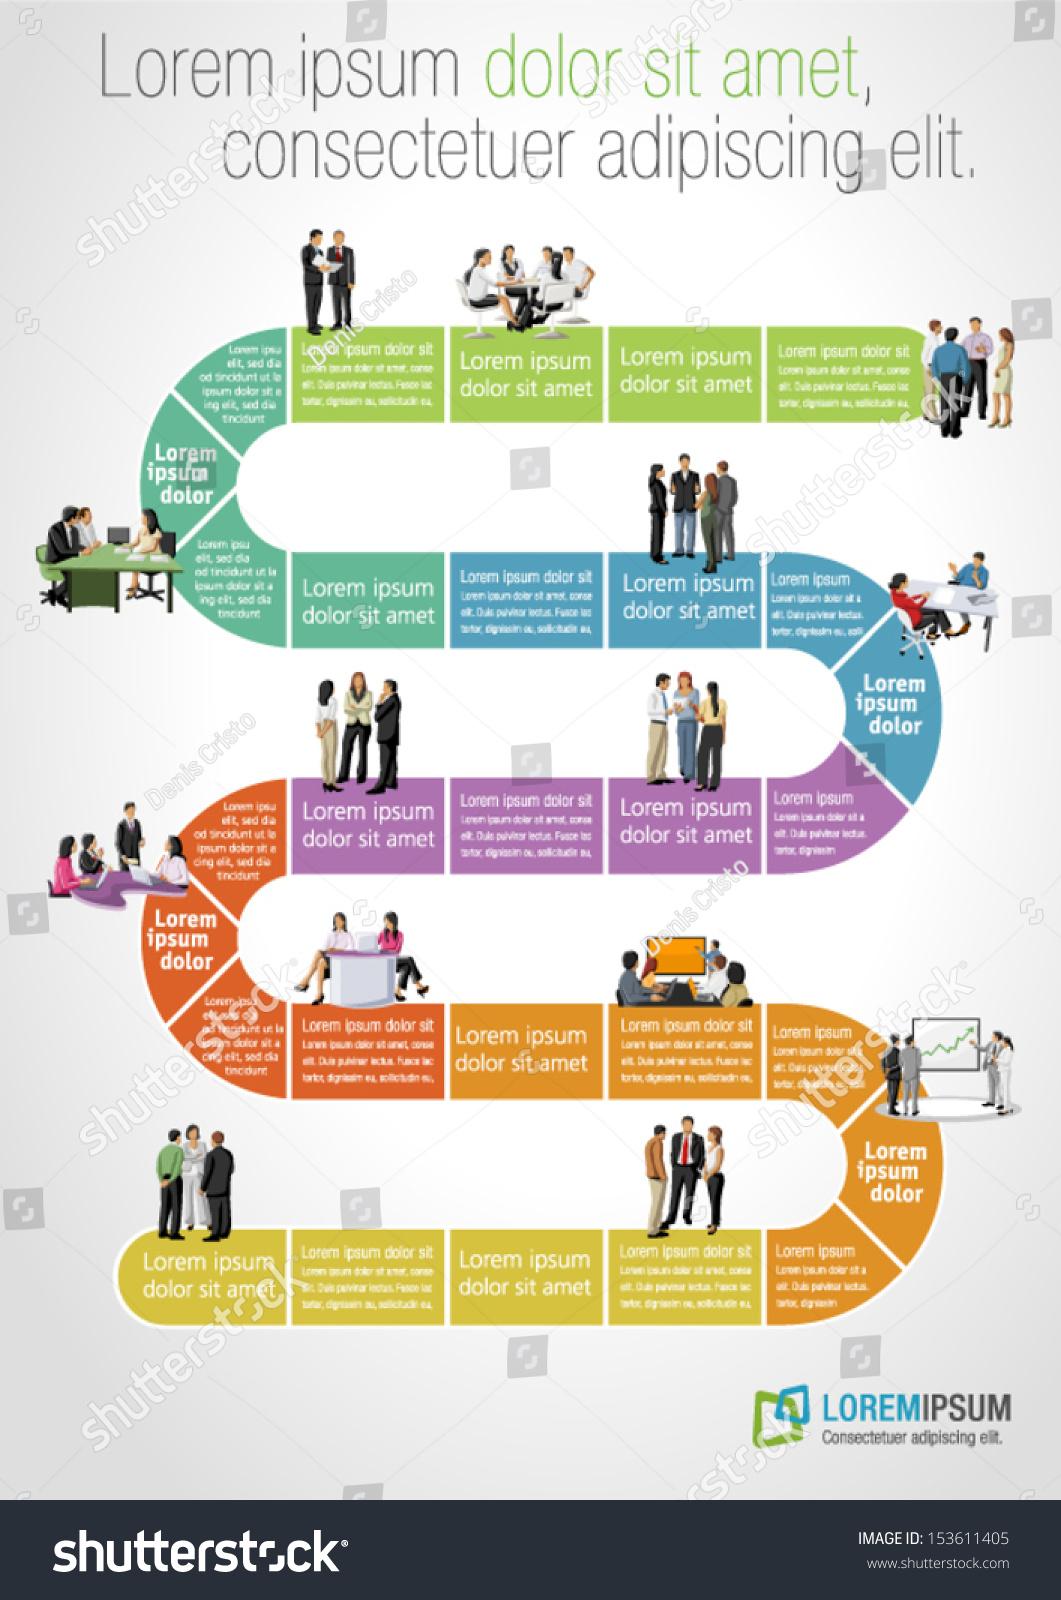 template advertising brochure business people on stock vector template for advertising brochure business people on work flow